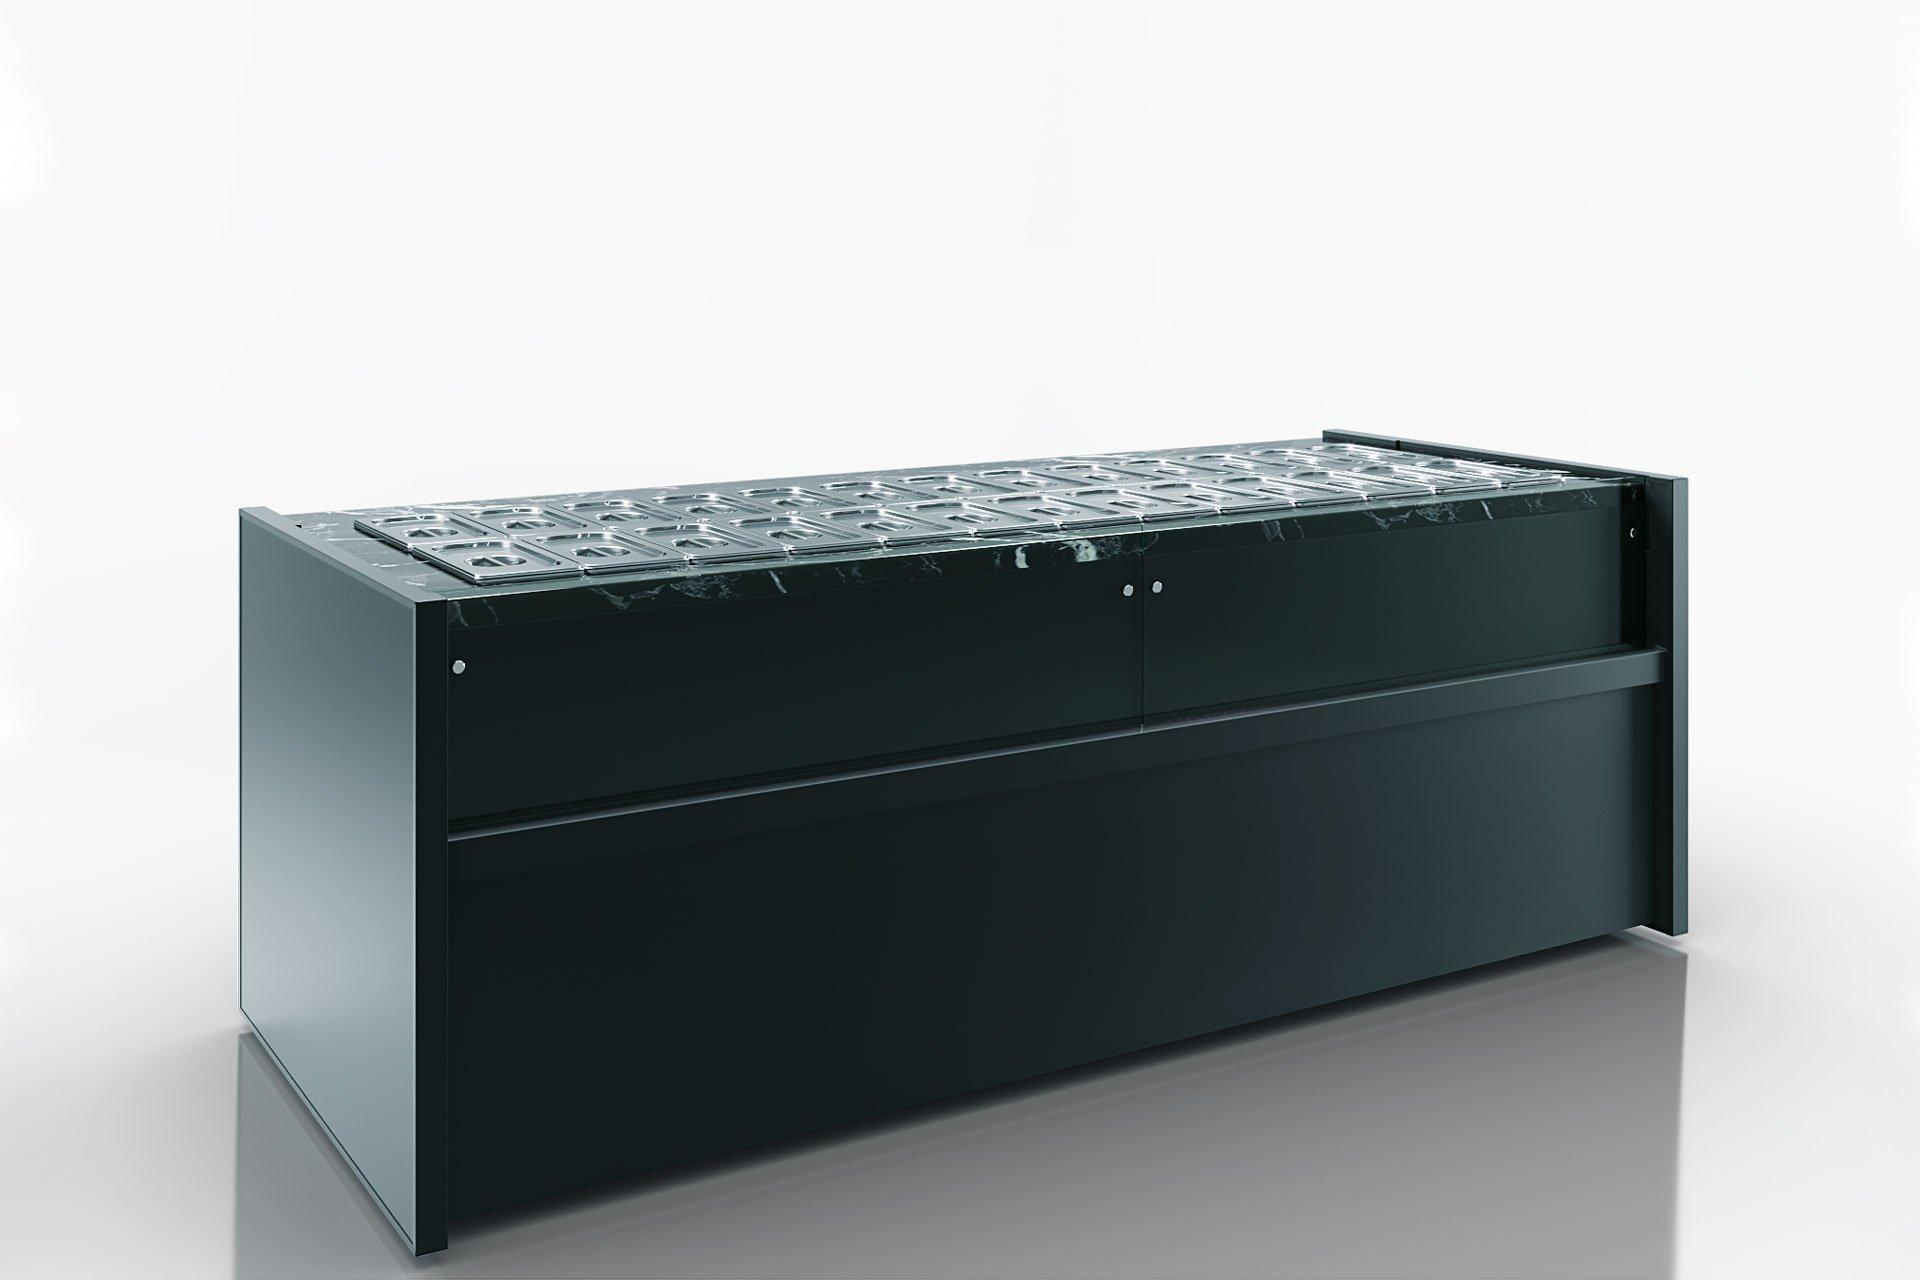 מקרר סלטיה MISSOURI MC 100 PICKLES SELF M/A